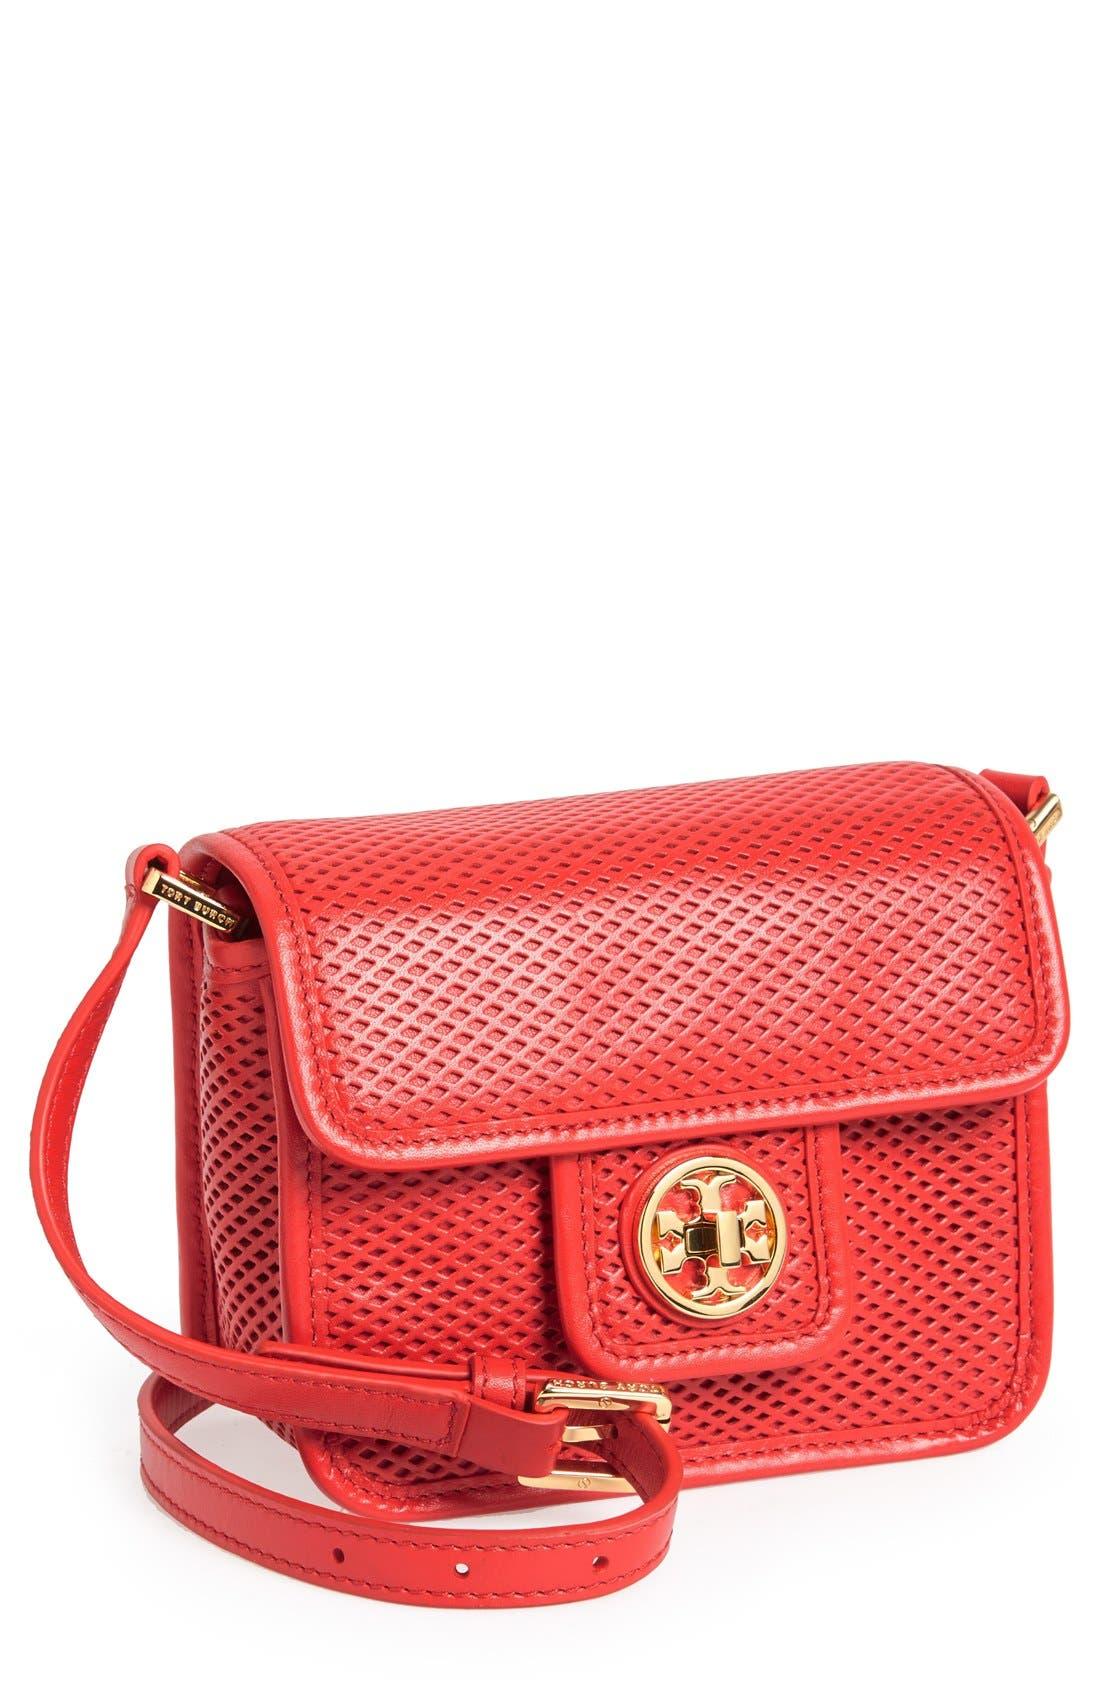 Main Image - Tory Burch 'Mini Harper' Leather Crossbody Bag